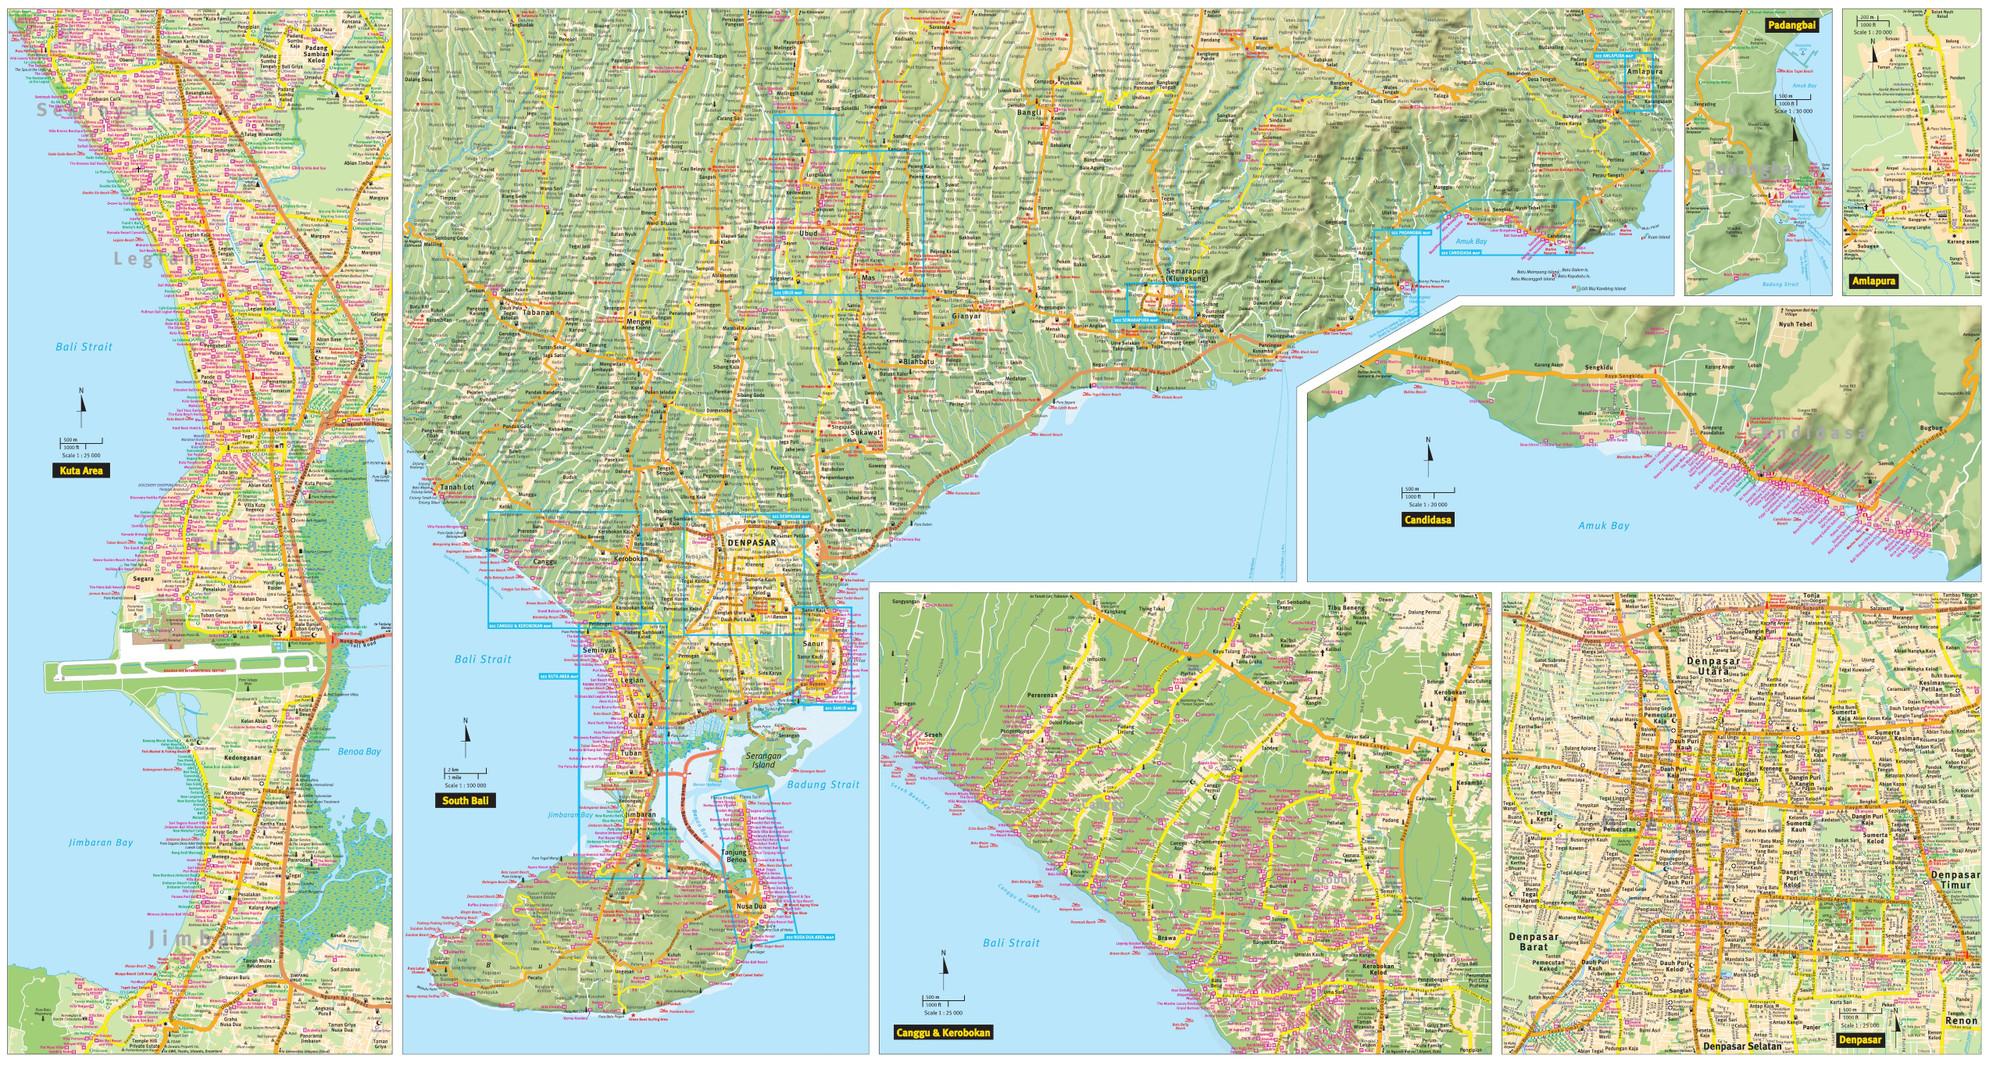 Bali Travel Map Ninth Edition on denpasar map, kuta map, bora bora map, china map, flores map, bali pictures, bhutan map, pacific map, japan map, kuala lumpur map, sulawesi map, new caledonia map, cambodia map, bali news, italy map, thailand map, cape town map, bali information, bali travel, java map, fiji map, world map, indonesia map, tahiti map,